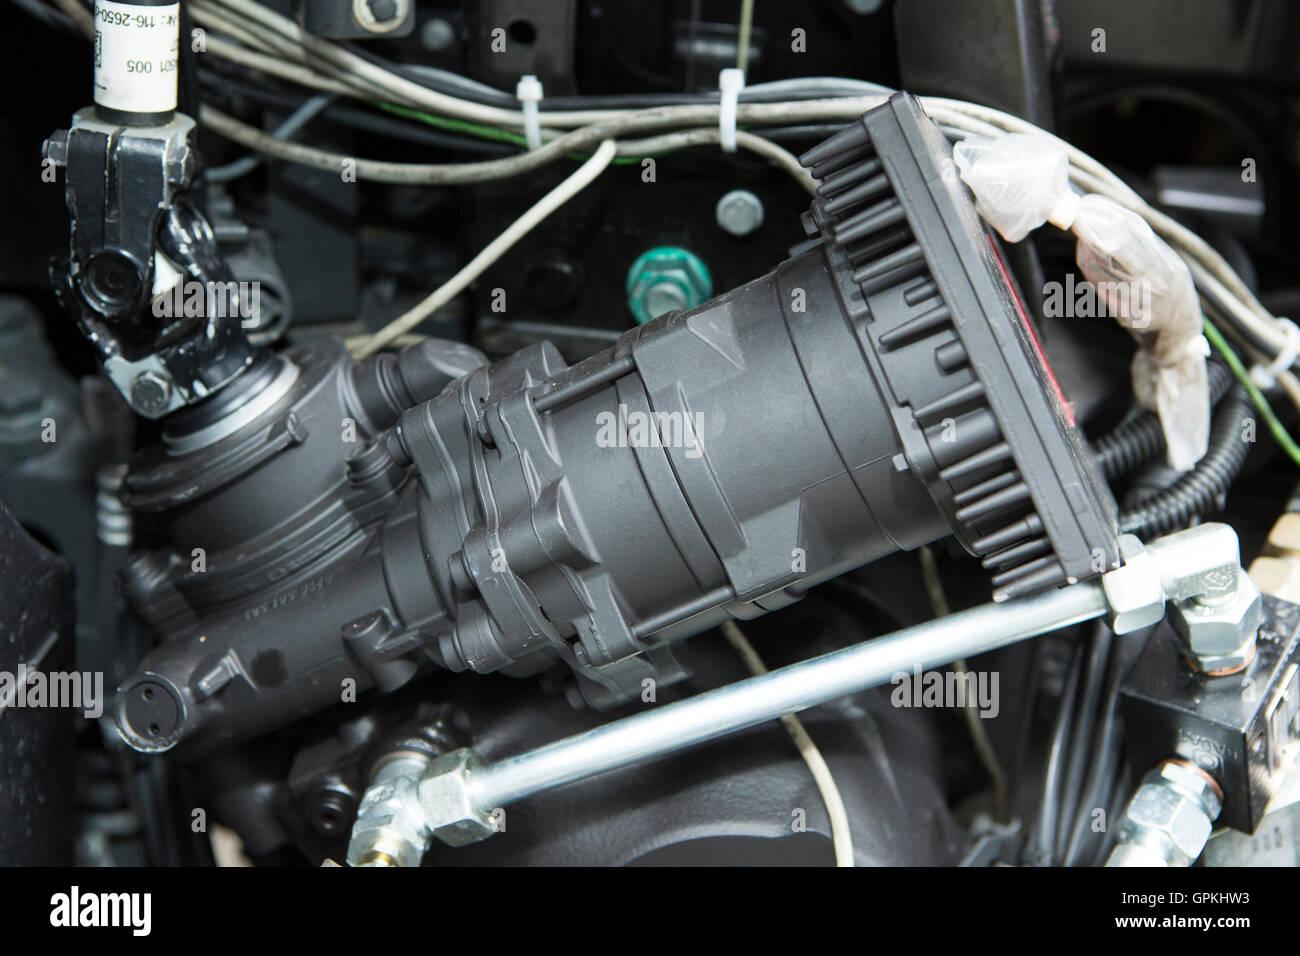 Supplier Car Parts Stockfotos & Supplier Car Parts Bilder - Seite 2 ...